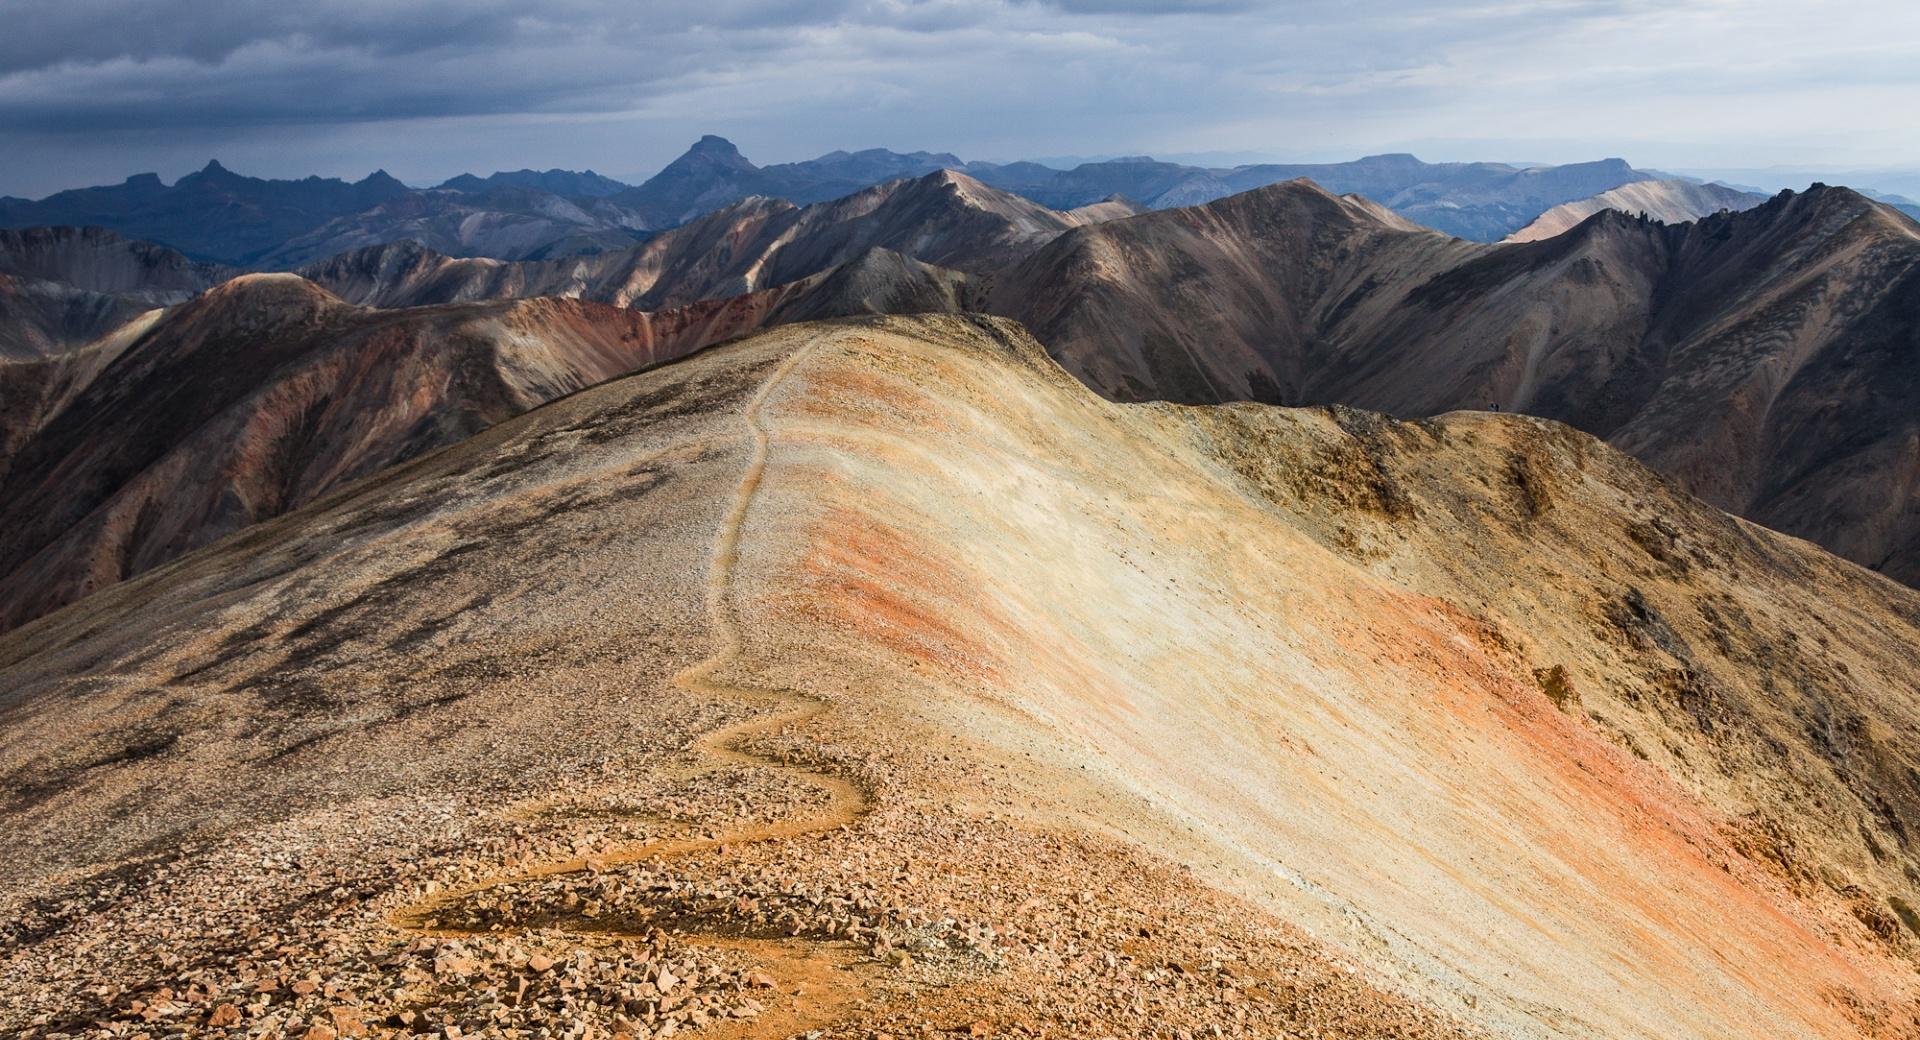 Redcloud Peak Mountain Ridge wallpapers HD quality